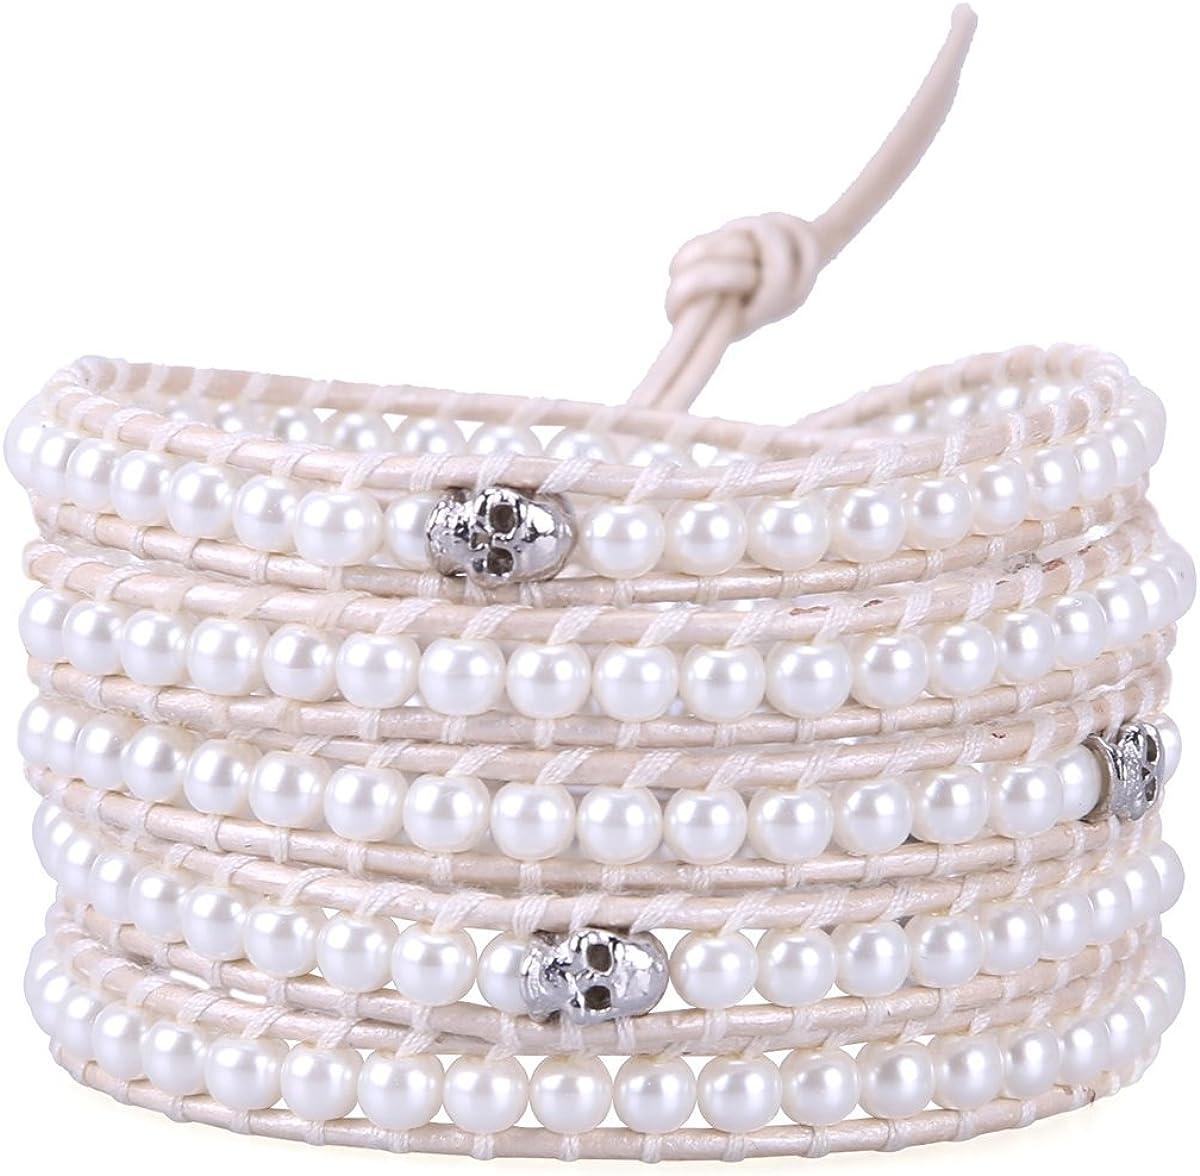 KELITCH Natural Gray Pearl Beaded 5 Wrap Bracelet Handmade Fashion Women Jewelry